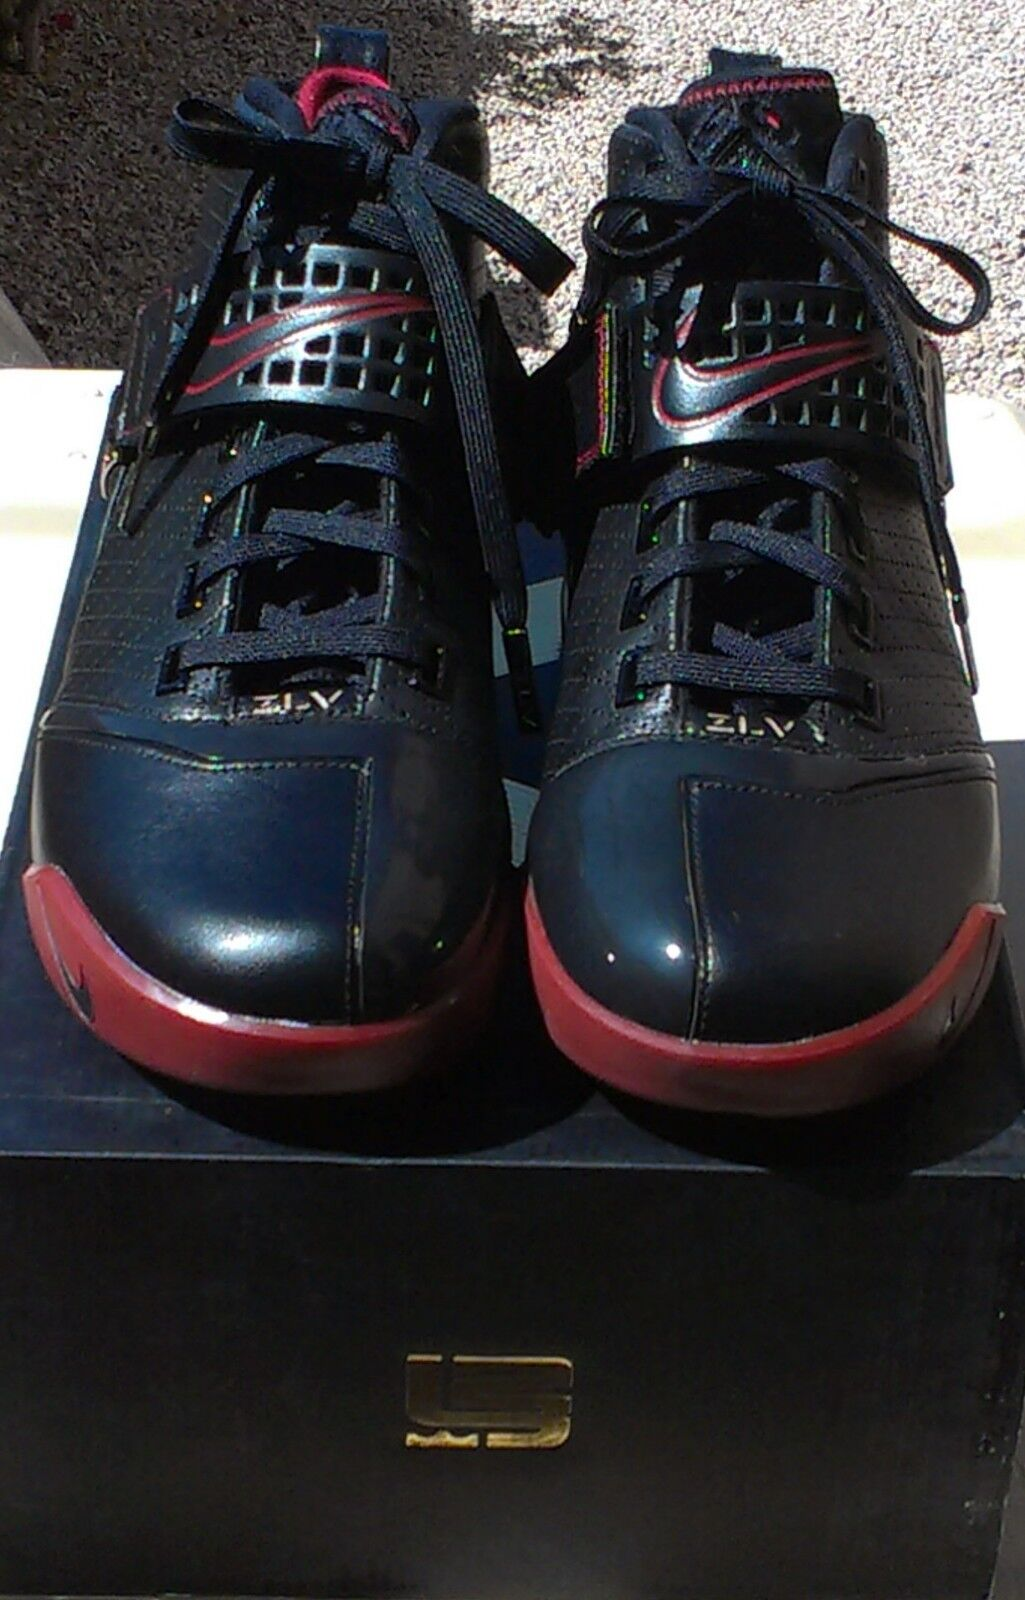 Nike Zoom LeBron V 5 (317253-001) - negro / rojo SZ / oro - Hombre SZ rojo nuevo en caja * 1543d5